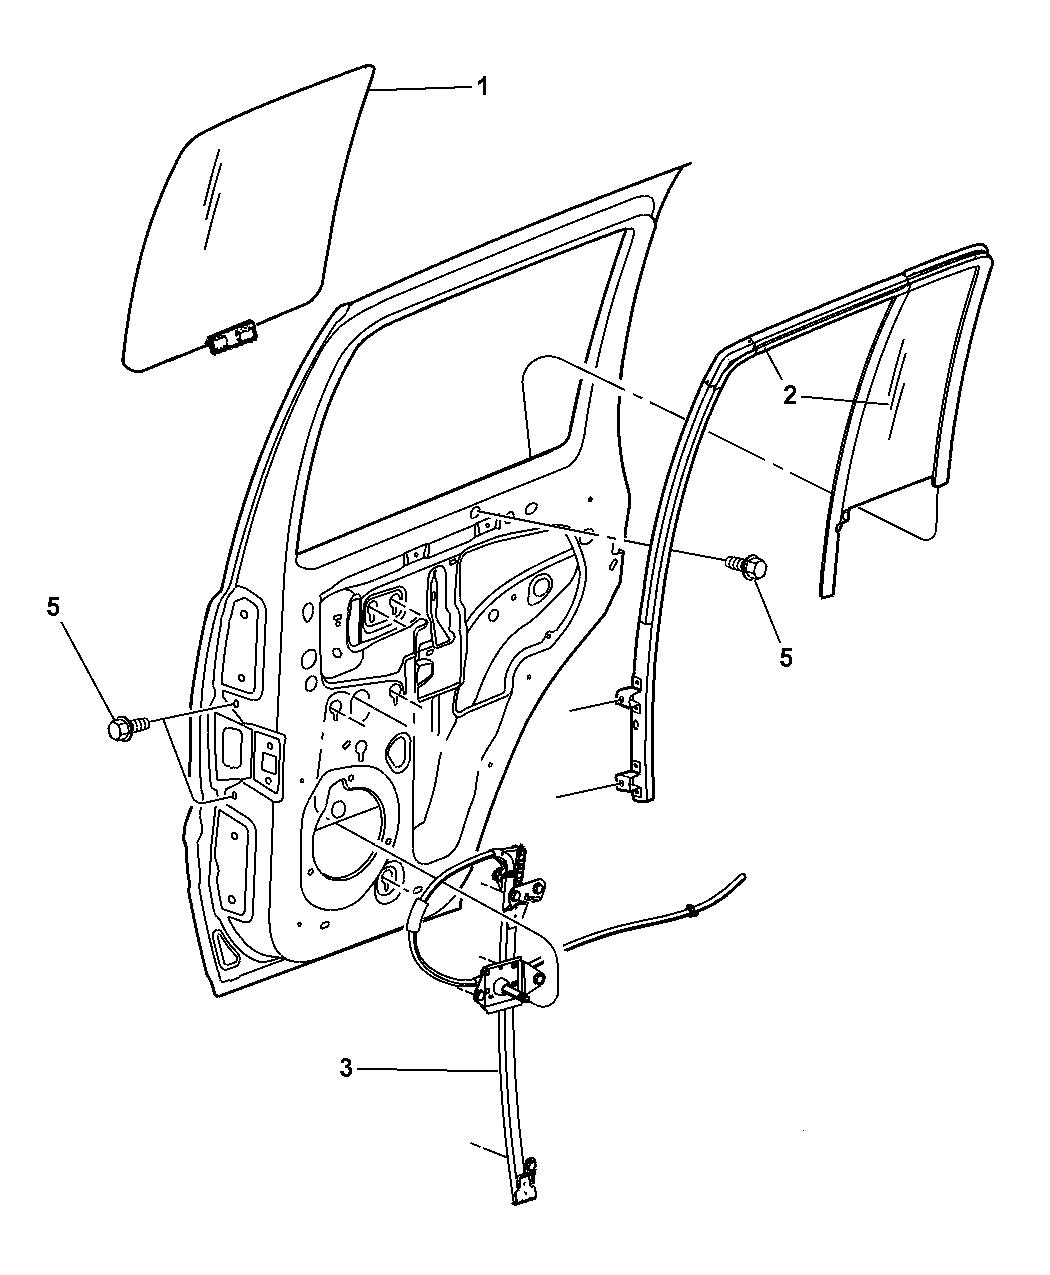 02-07 Jeep Liberty Power Window Regulator Left Rear Mopar Oem Revised Parts New